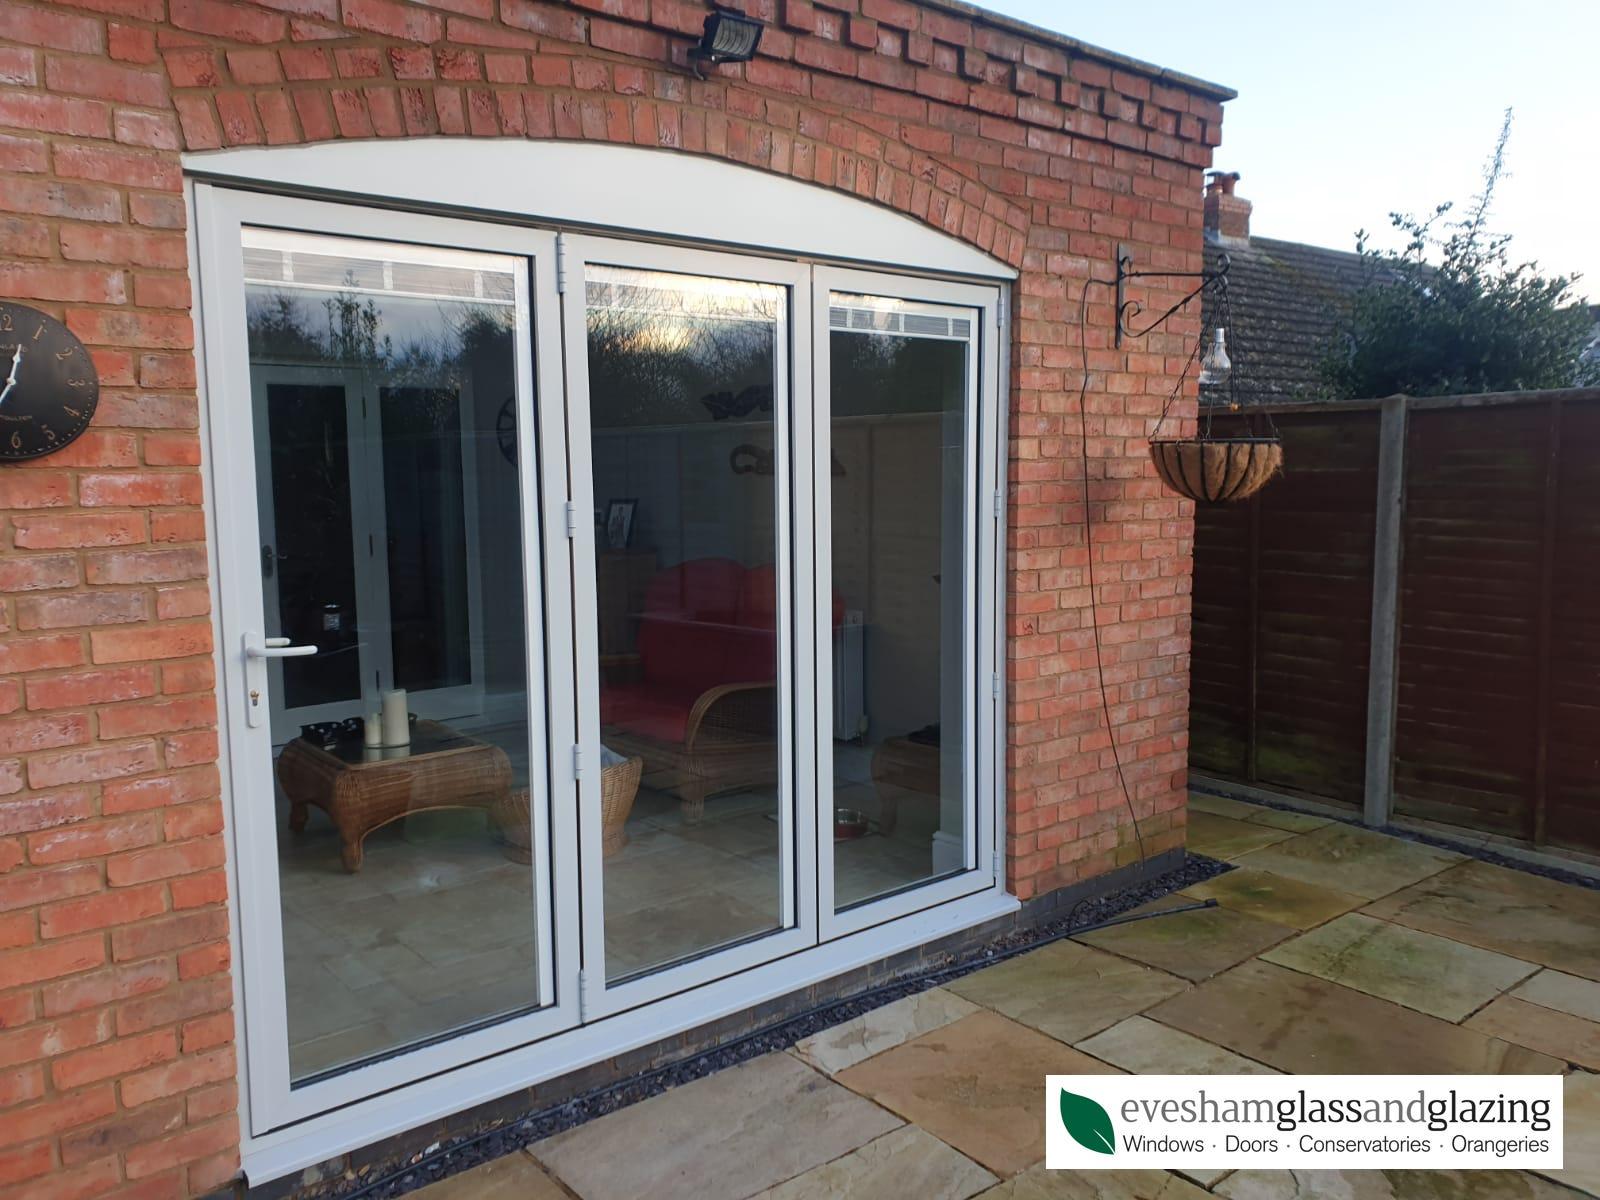 Mr Lloyd-Wright's Smart Visofold doors and Alitherm windows